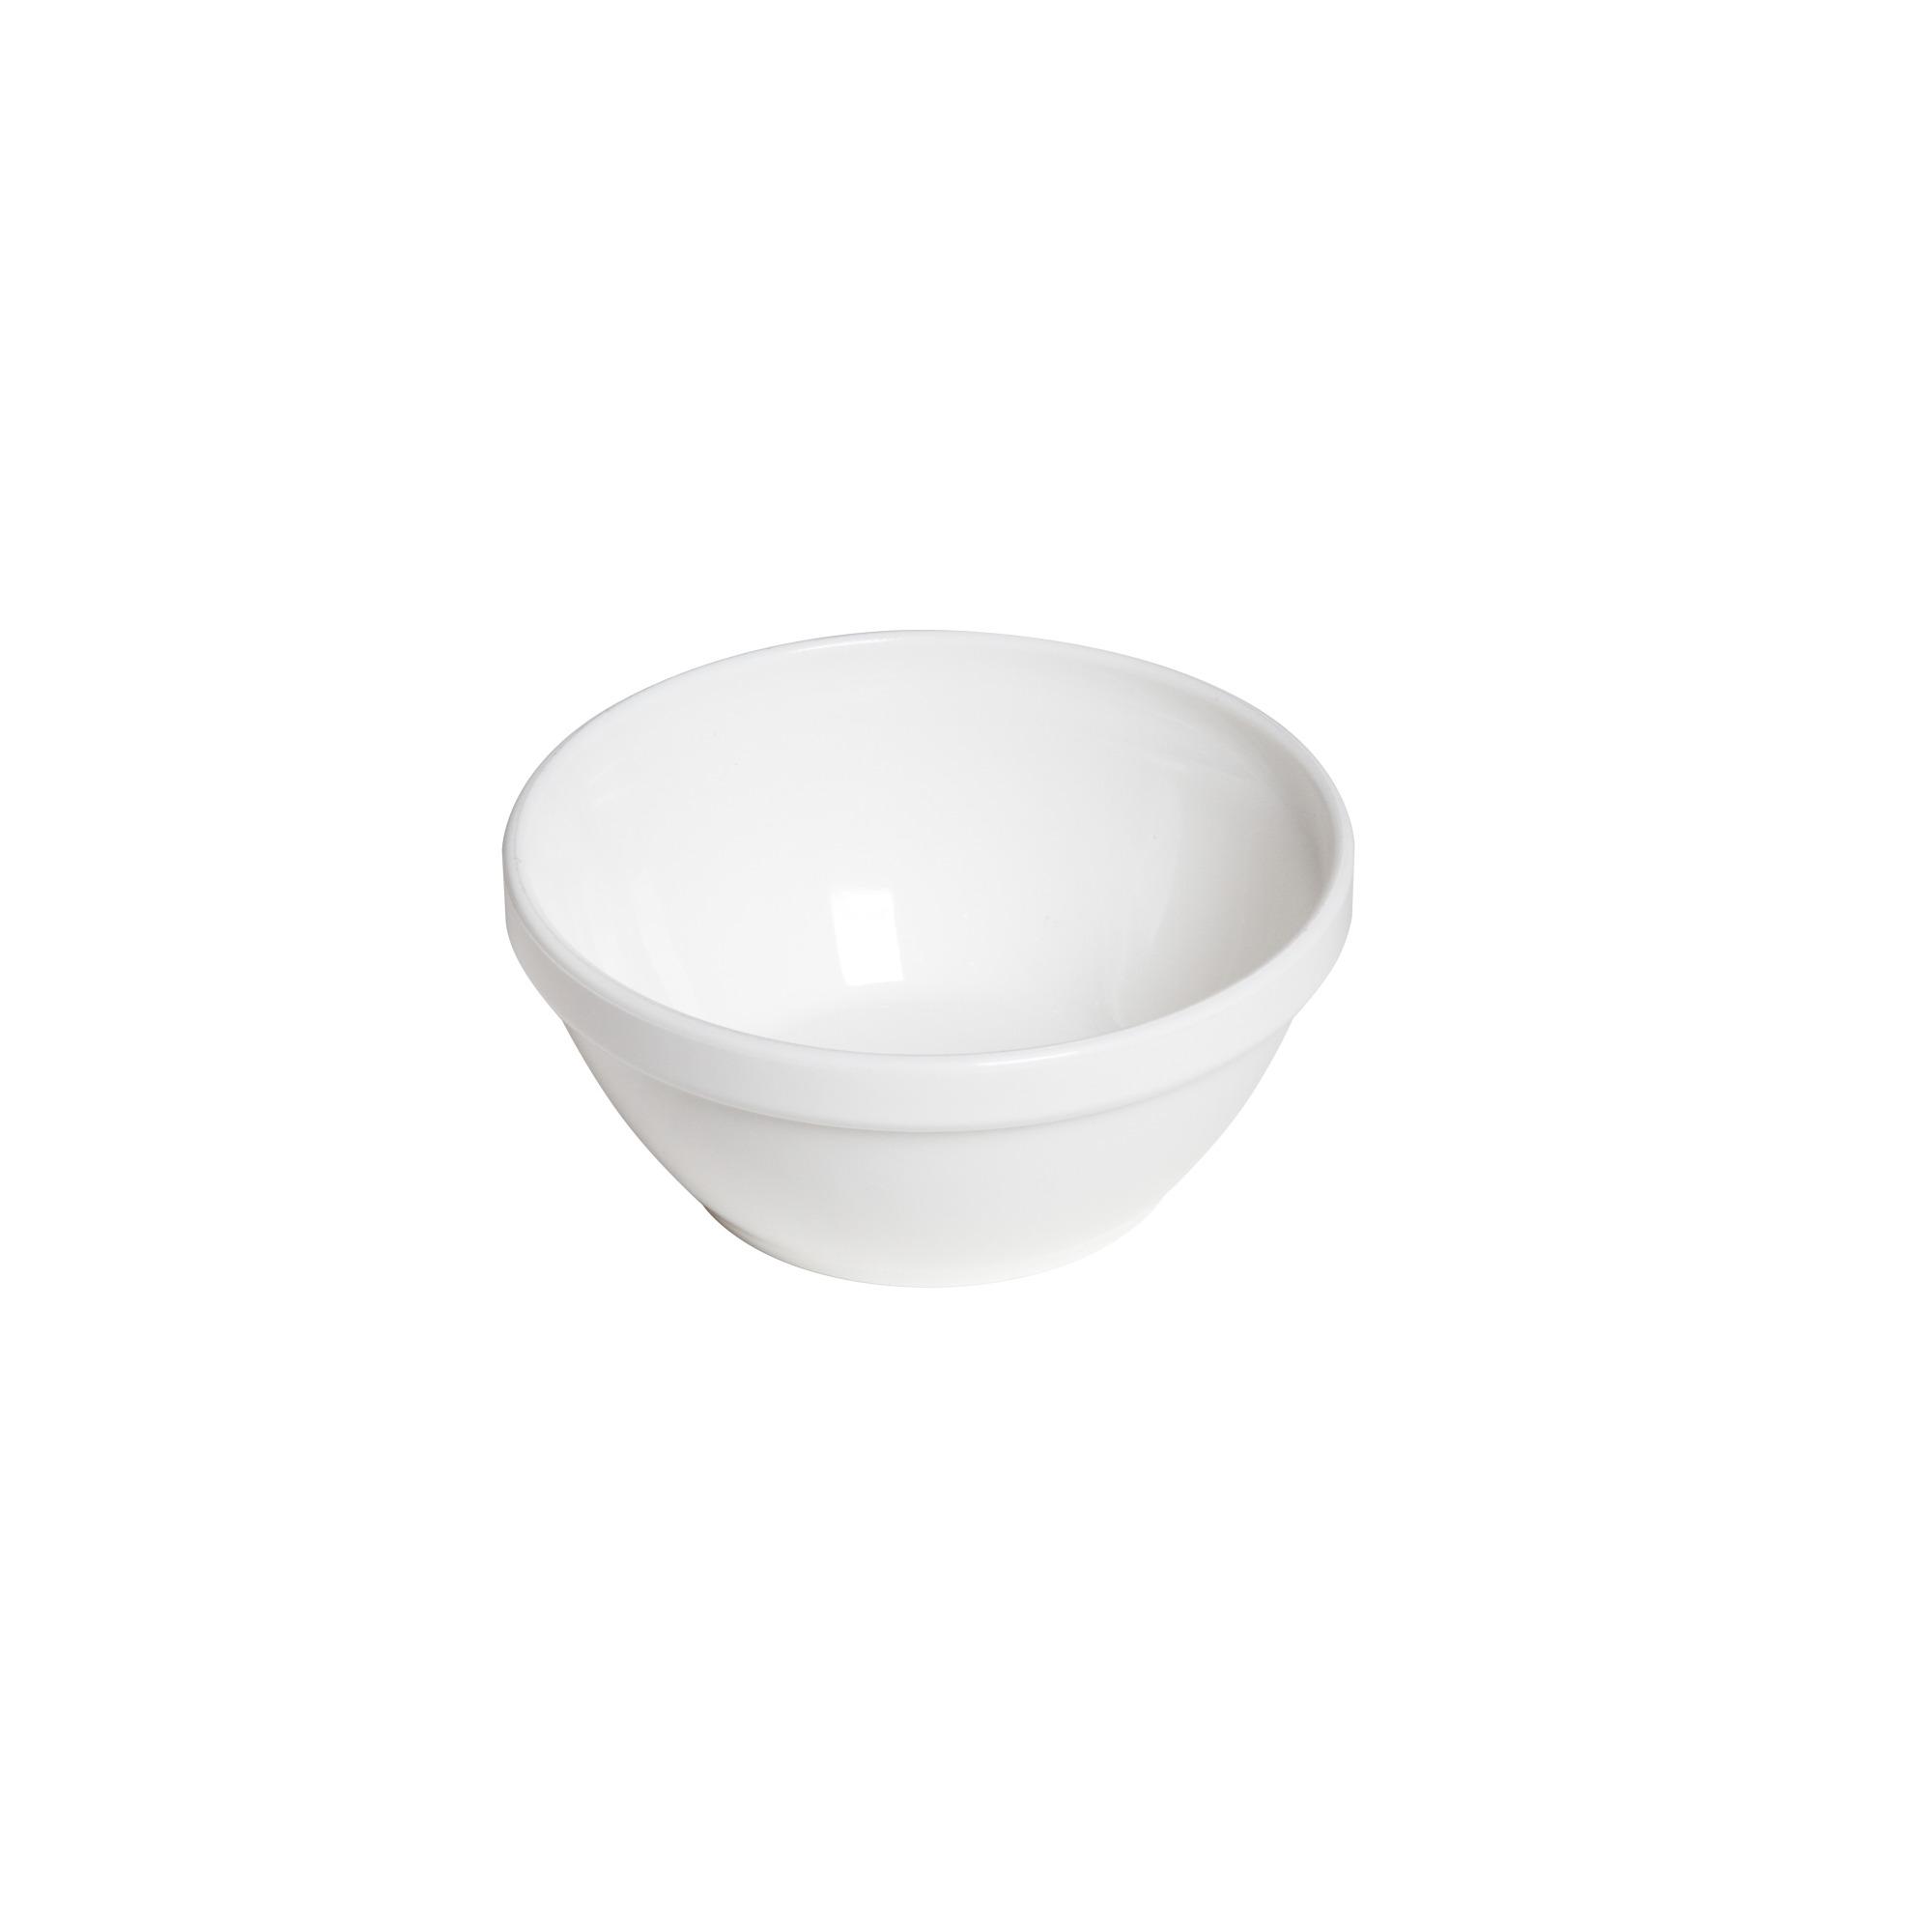 Tigela de Plastico 250ml - 266 - Vem Plast